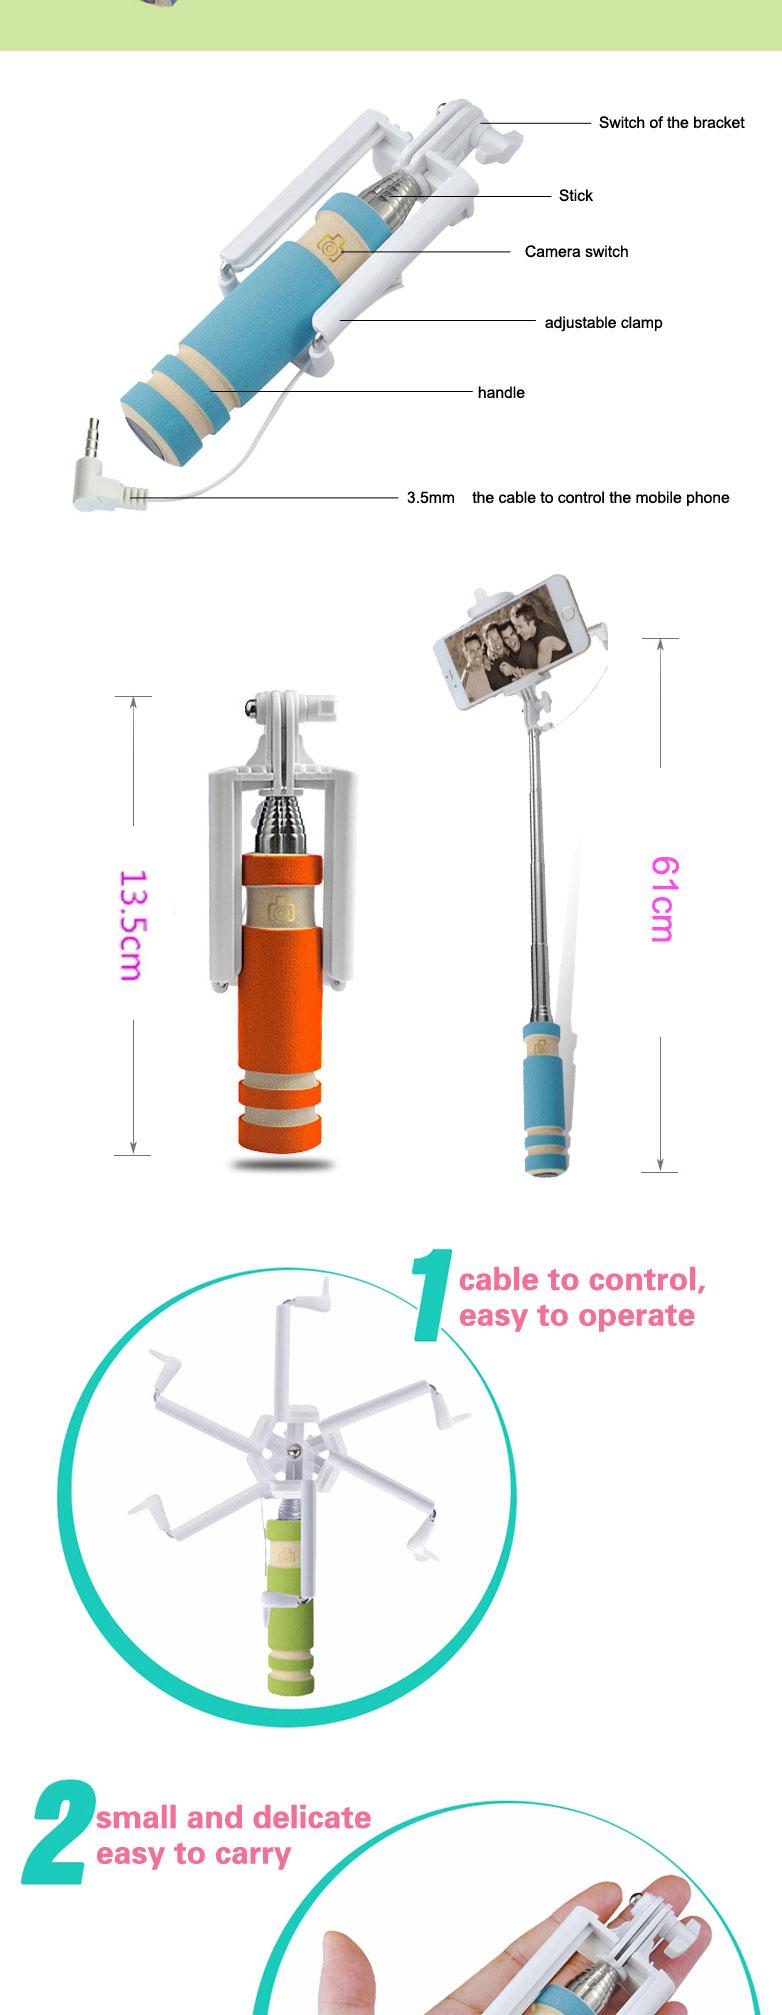 Atacado wired mini handheld monopé selfie varas com dobrável, dobrável monopé Selfie stick-com cabo